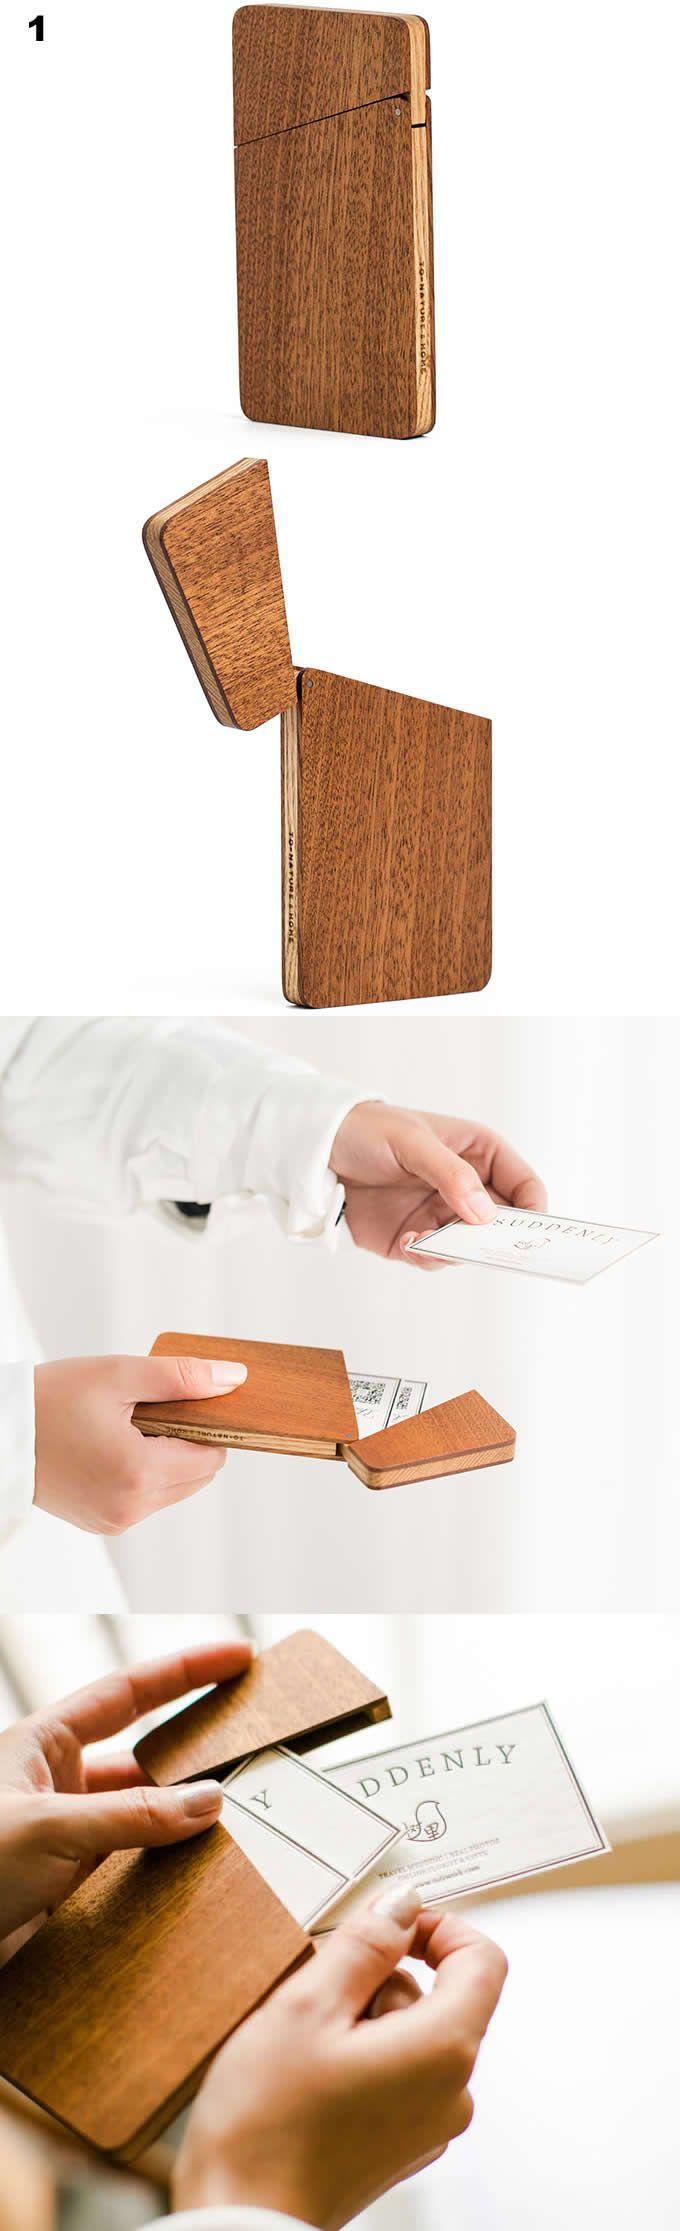 Handmade Wooden Business Card Case Holder